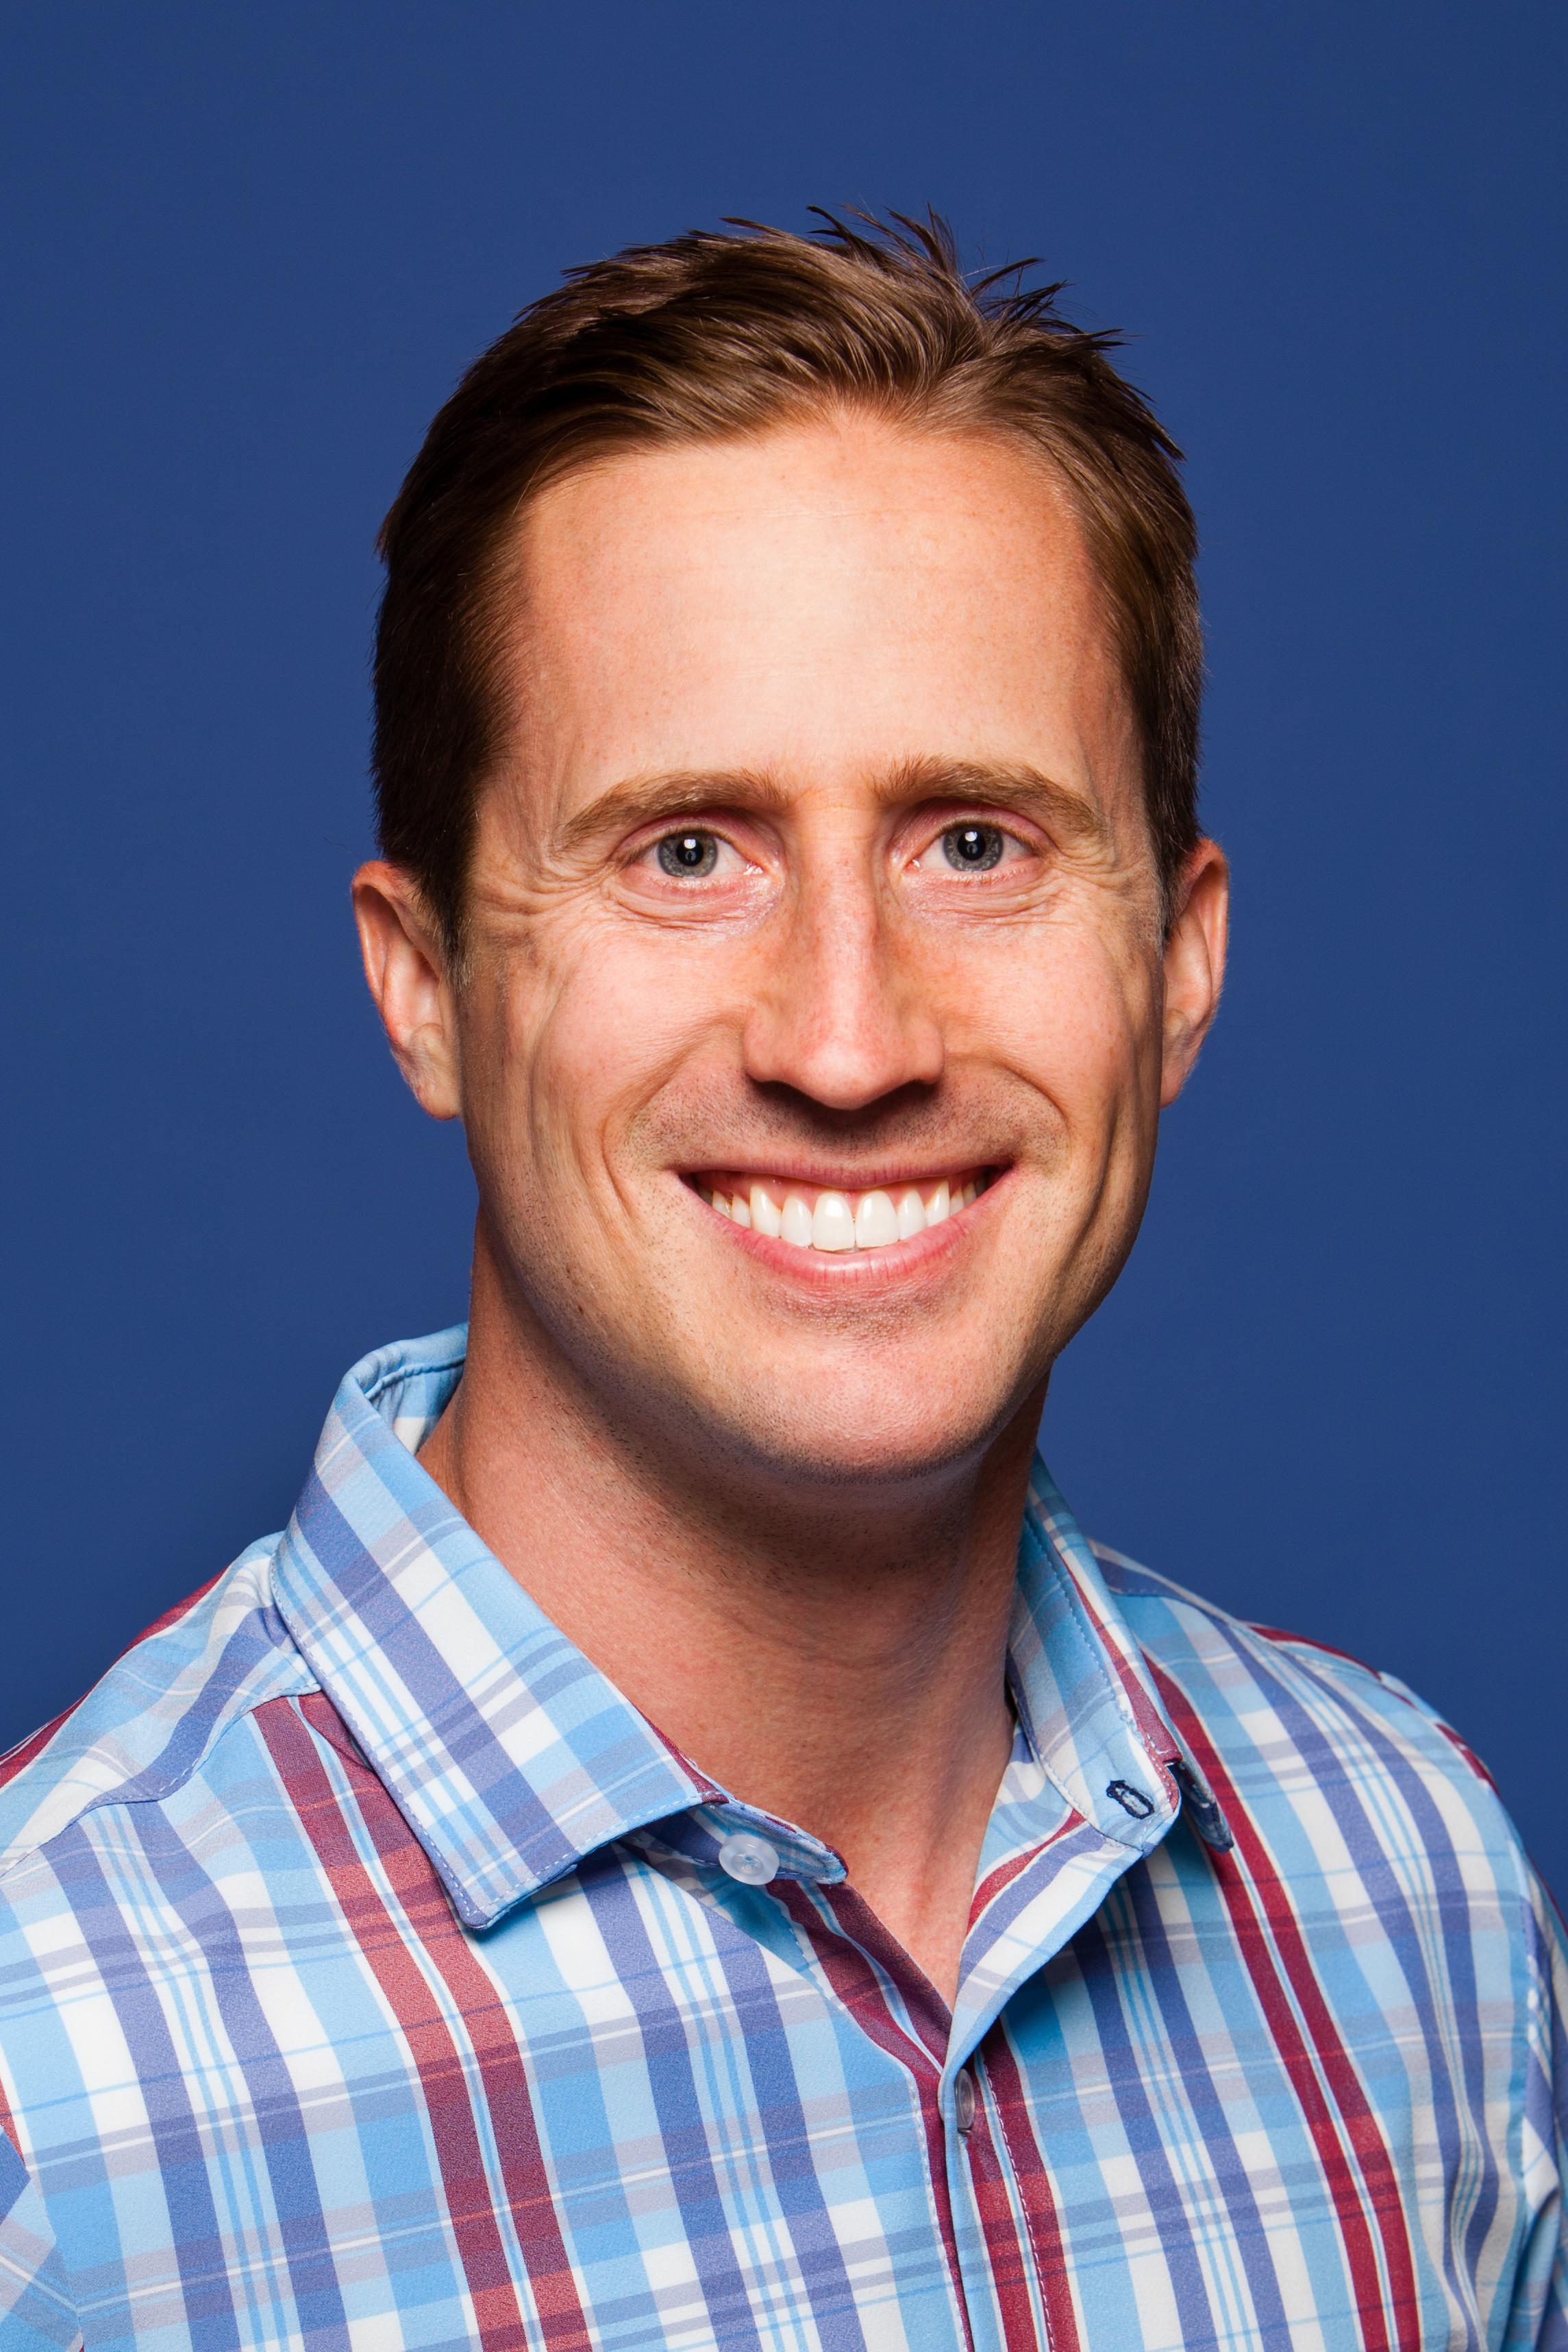 Greg Roeder